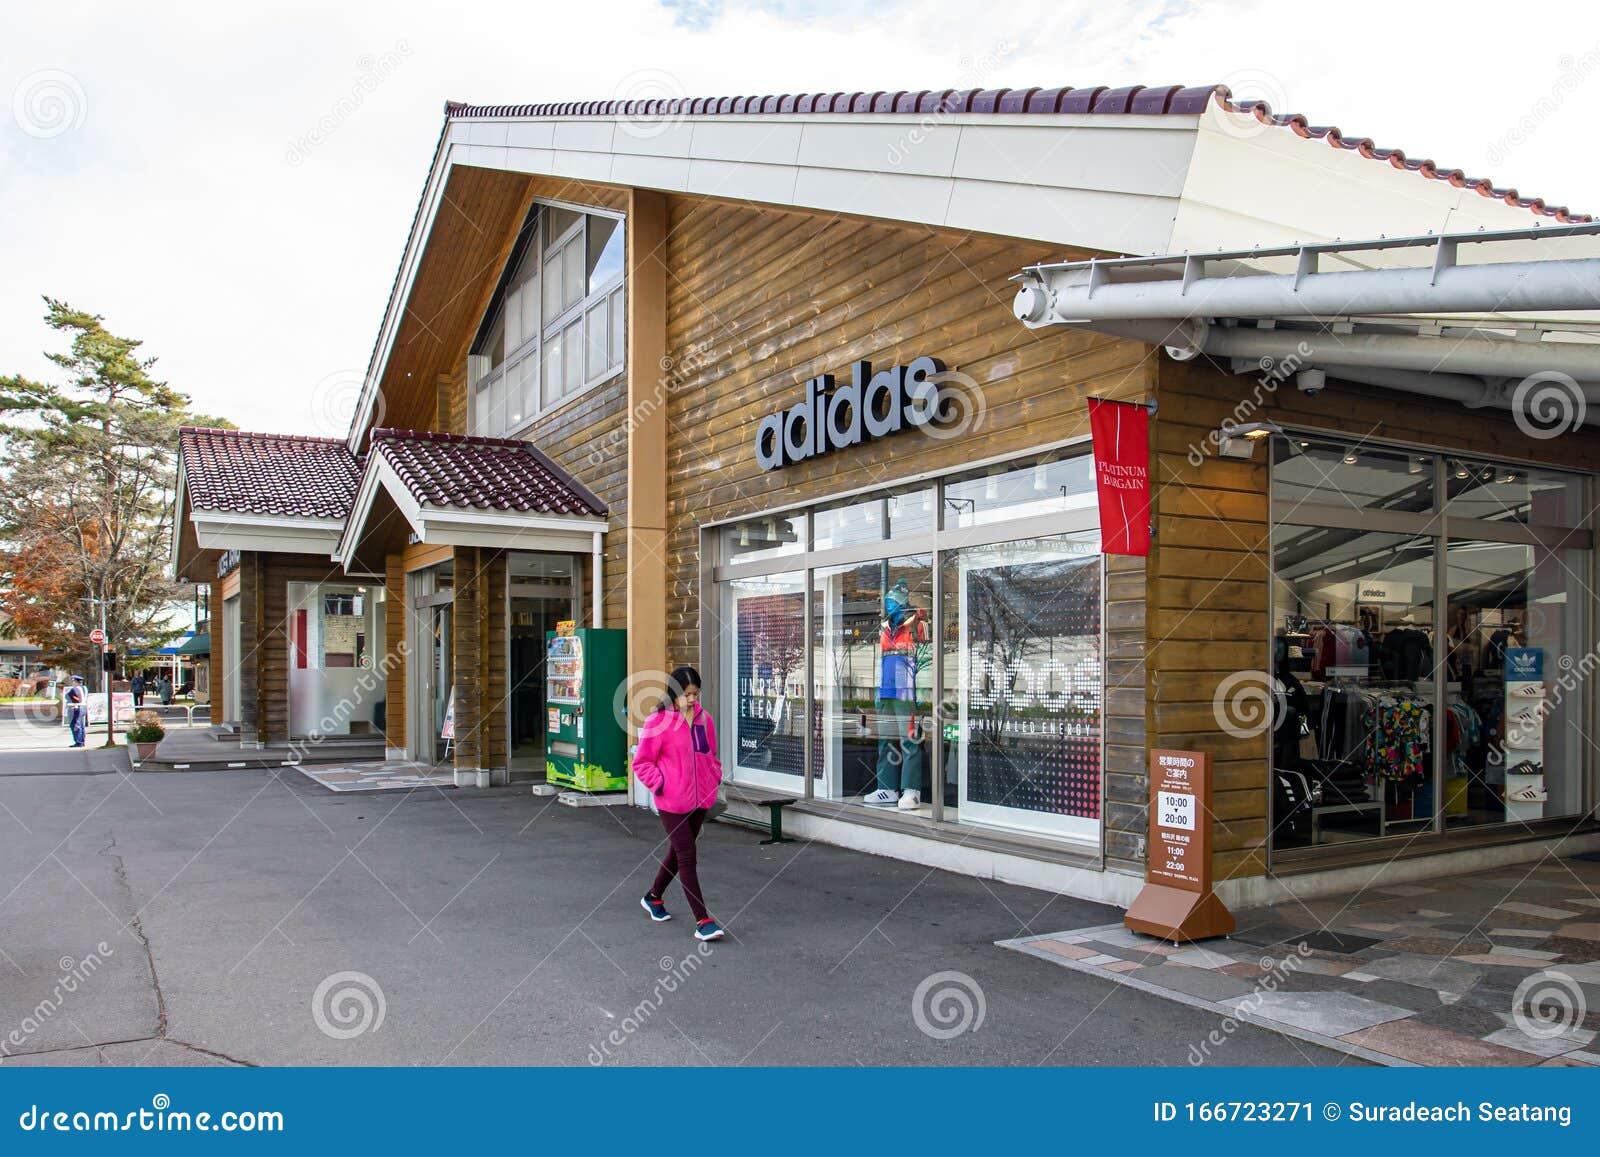 recuperar encima rodar  Adidas Outlet Store In The Karuizawa Prince Shopping Plaza Editorial Photo  - Image of lake, editorial: 166723271